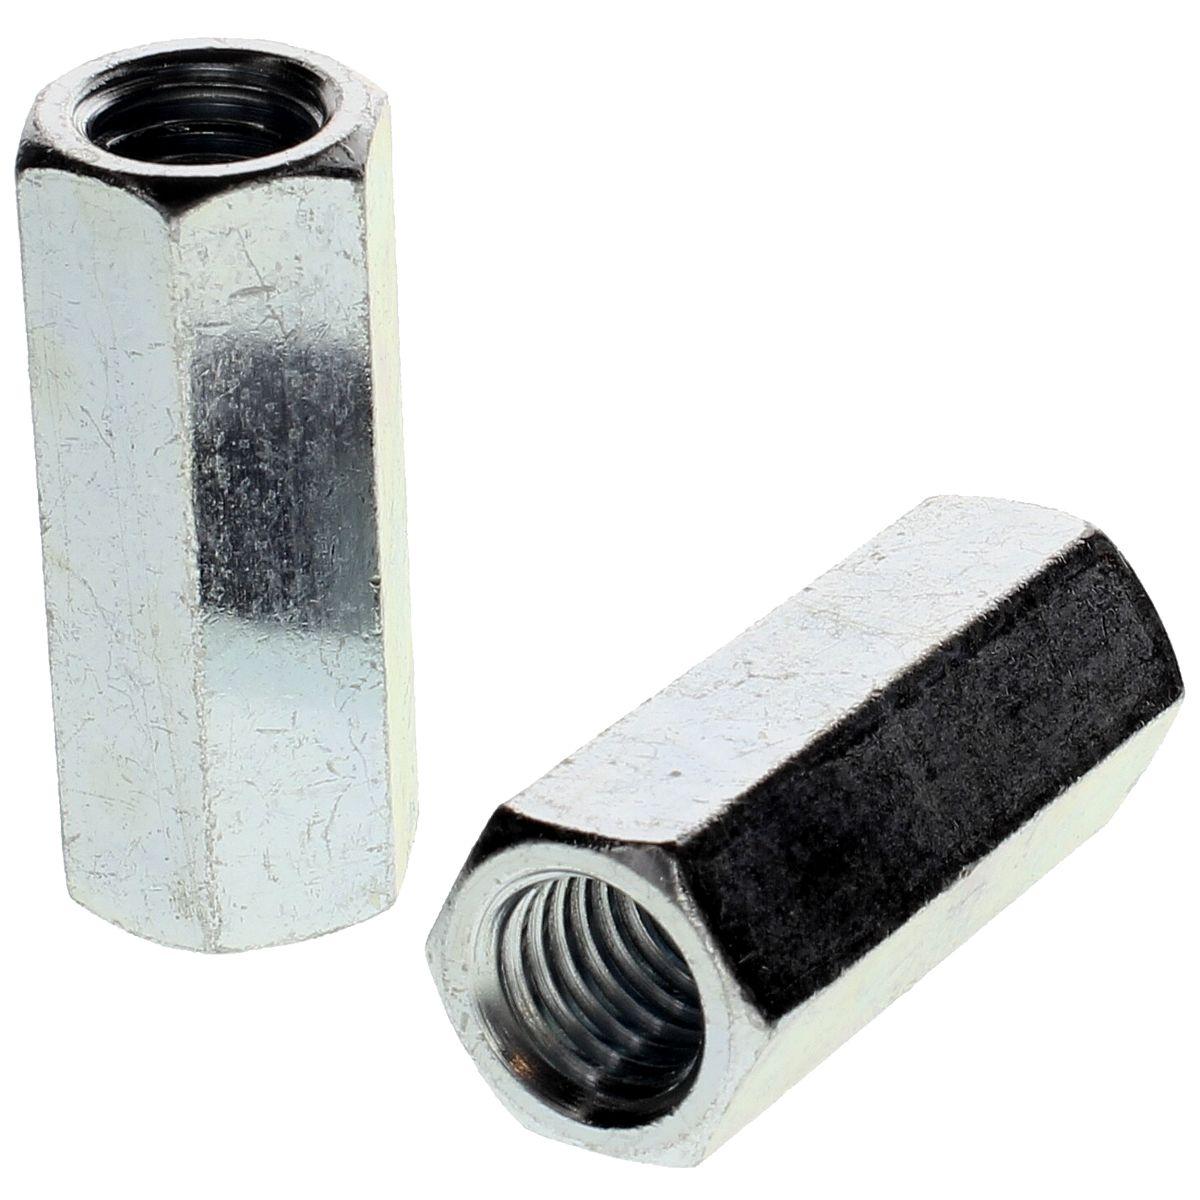 "#10-32 x 3/4"" Hex Coupling Nuts — ASTM A563 Grade A, Zinc, Fine, 50/PKG"